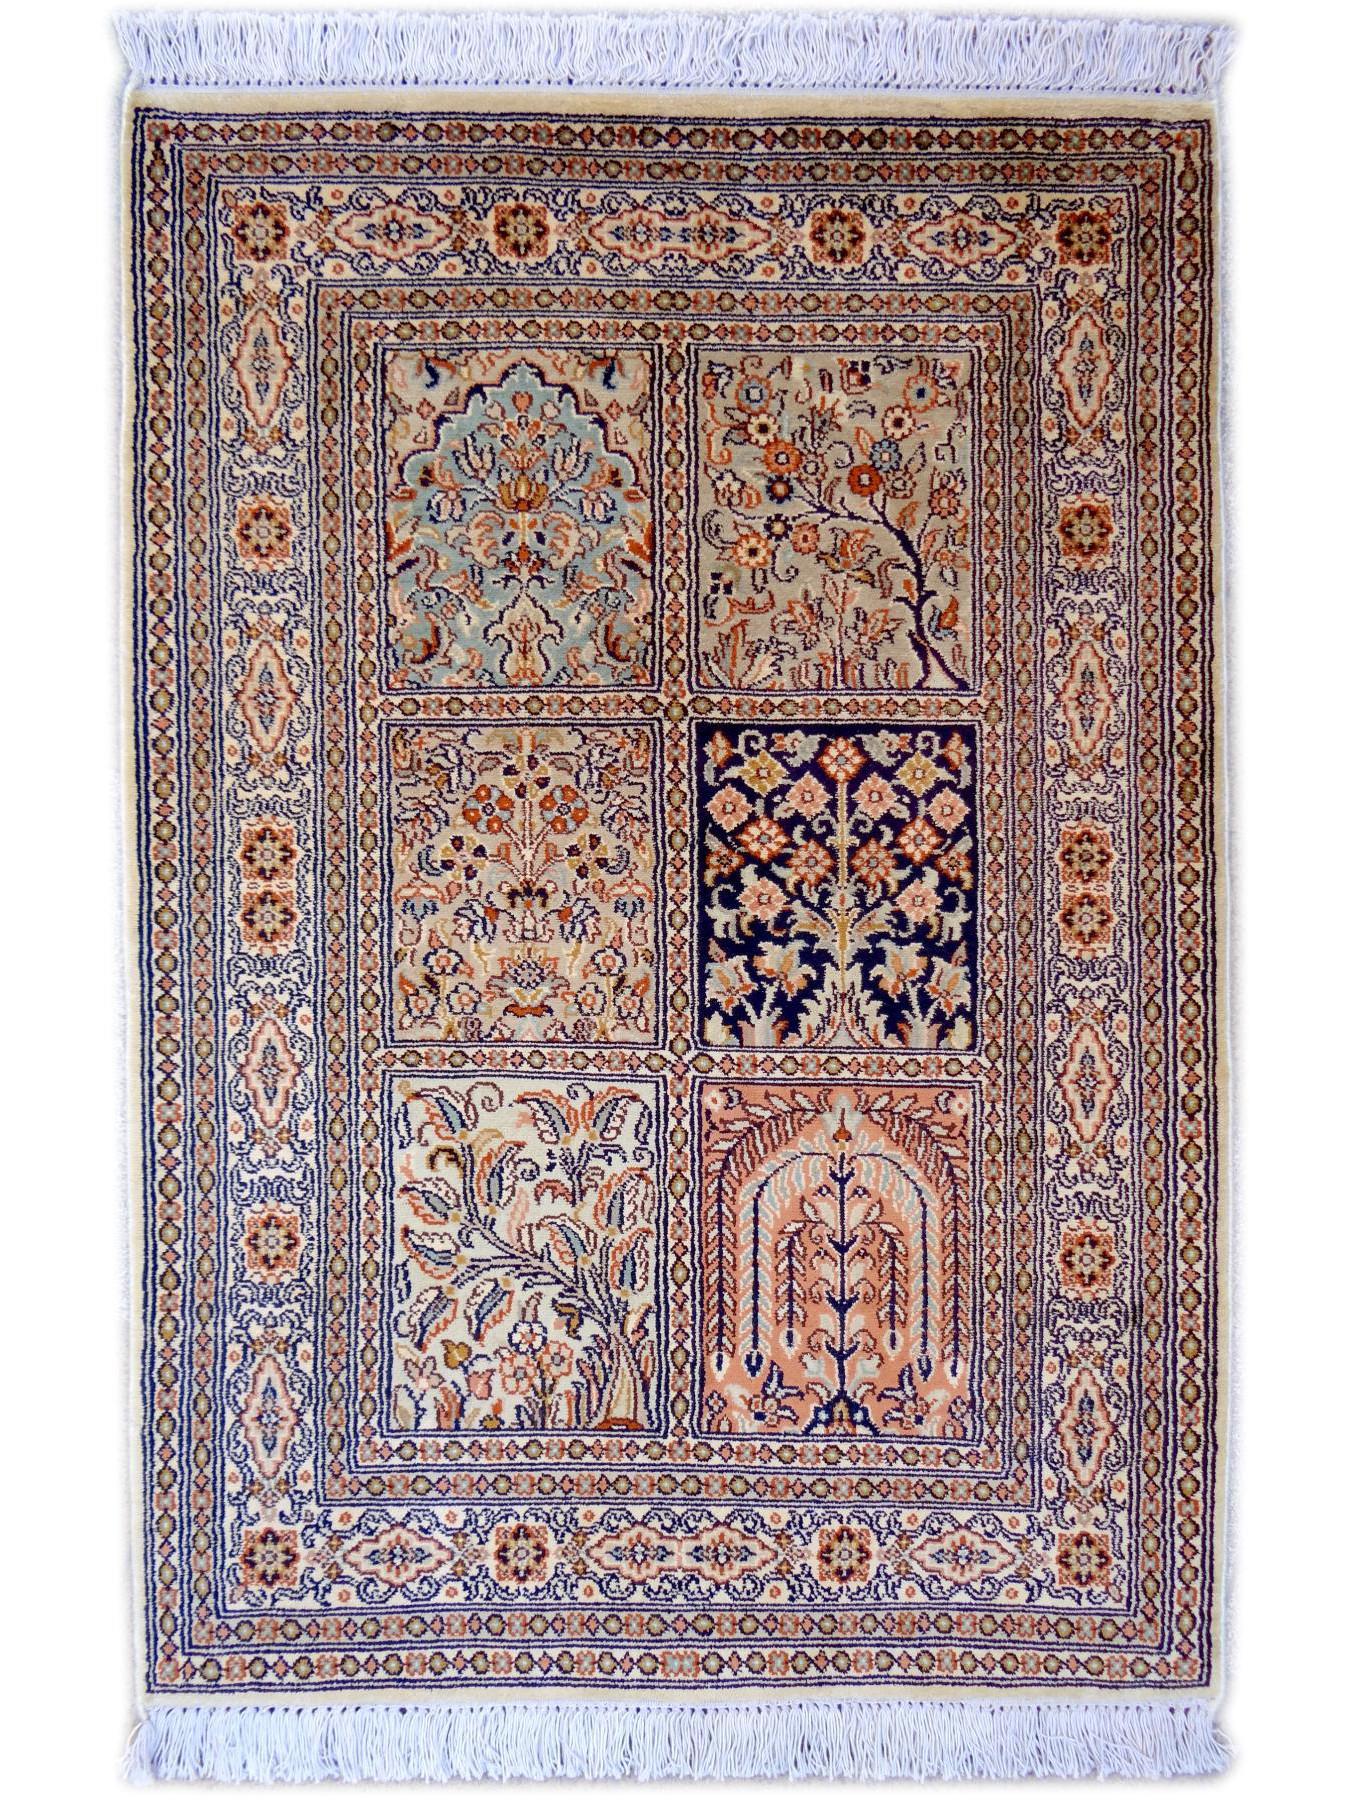 srinagar soie jardin tapis prestigieux n 2489 90x63cm. Black Bedroom Furniture Sets. Home Design Ideas